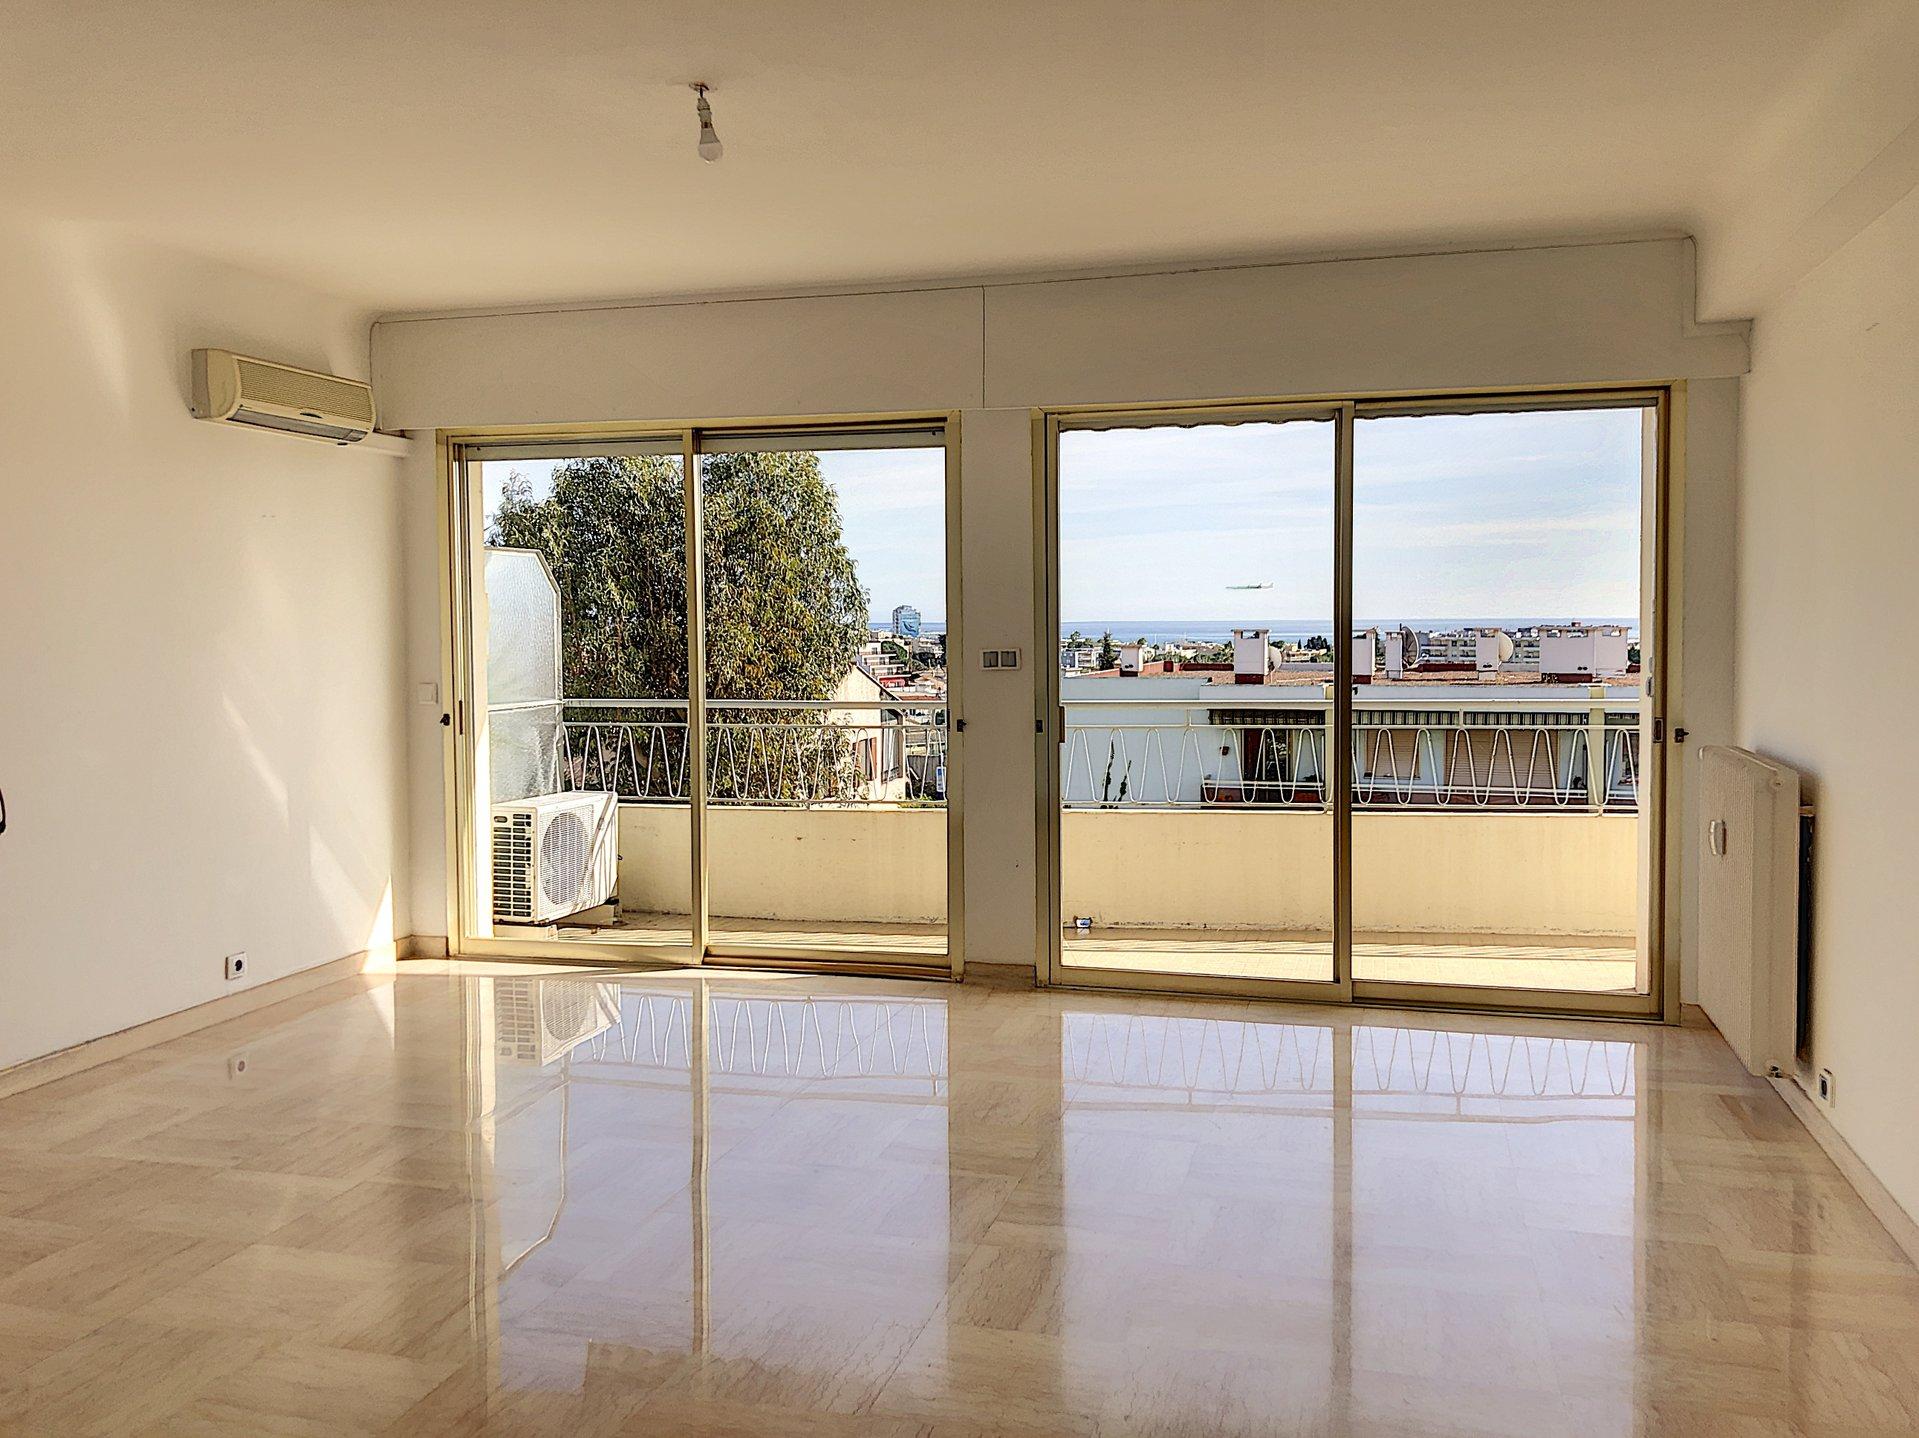 Cagnes sur Mer (06800) - Appartements 3P - Terrasse filante vue Mer